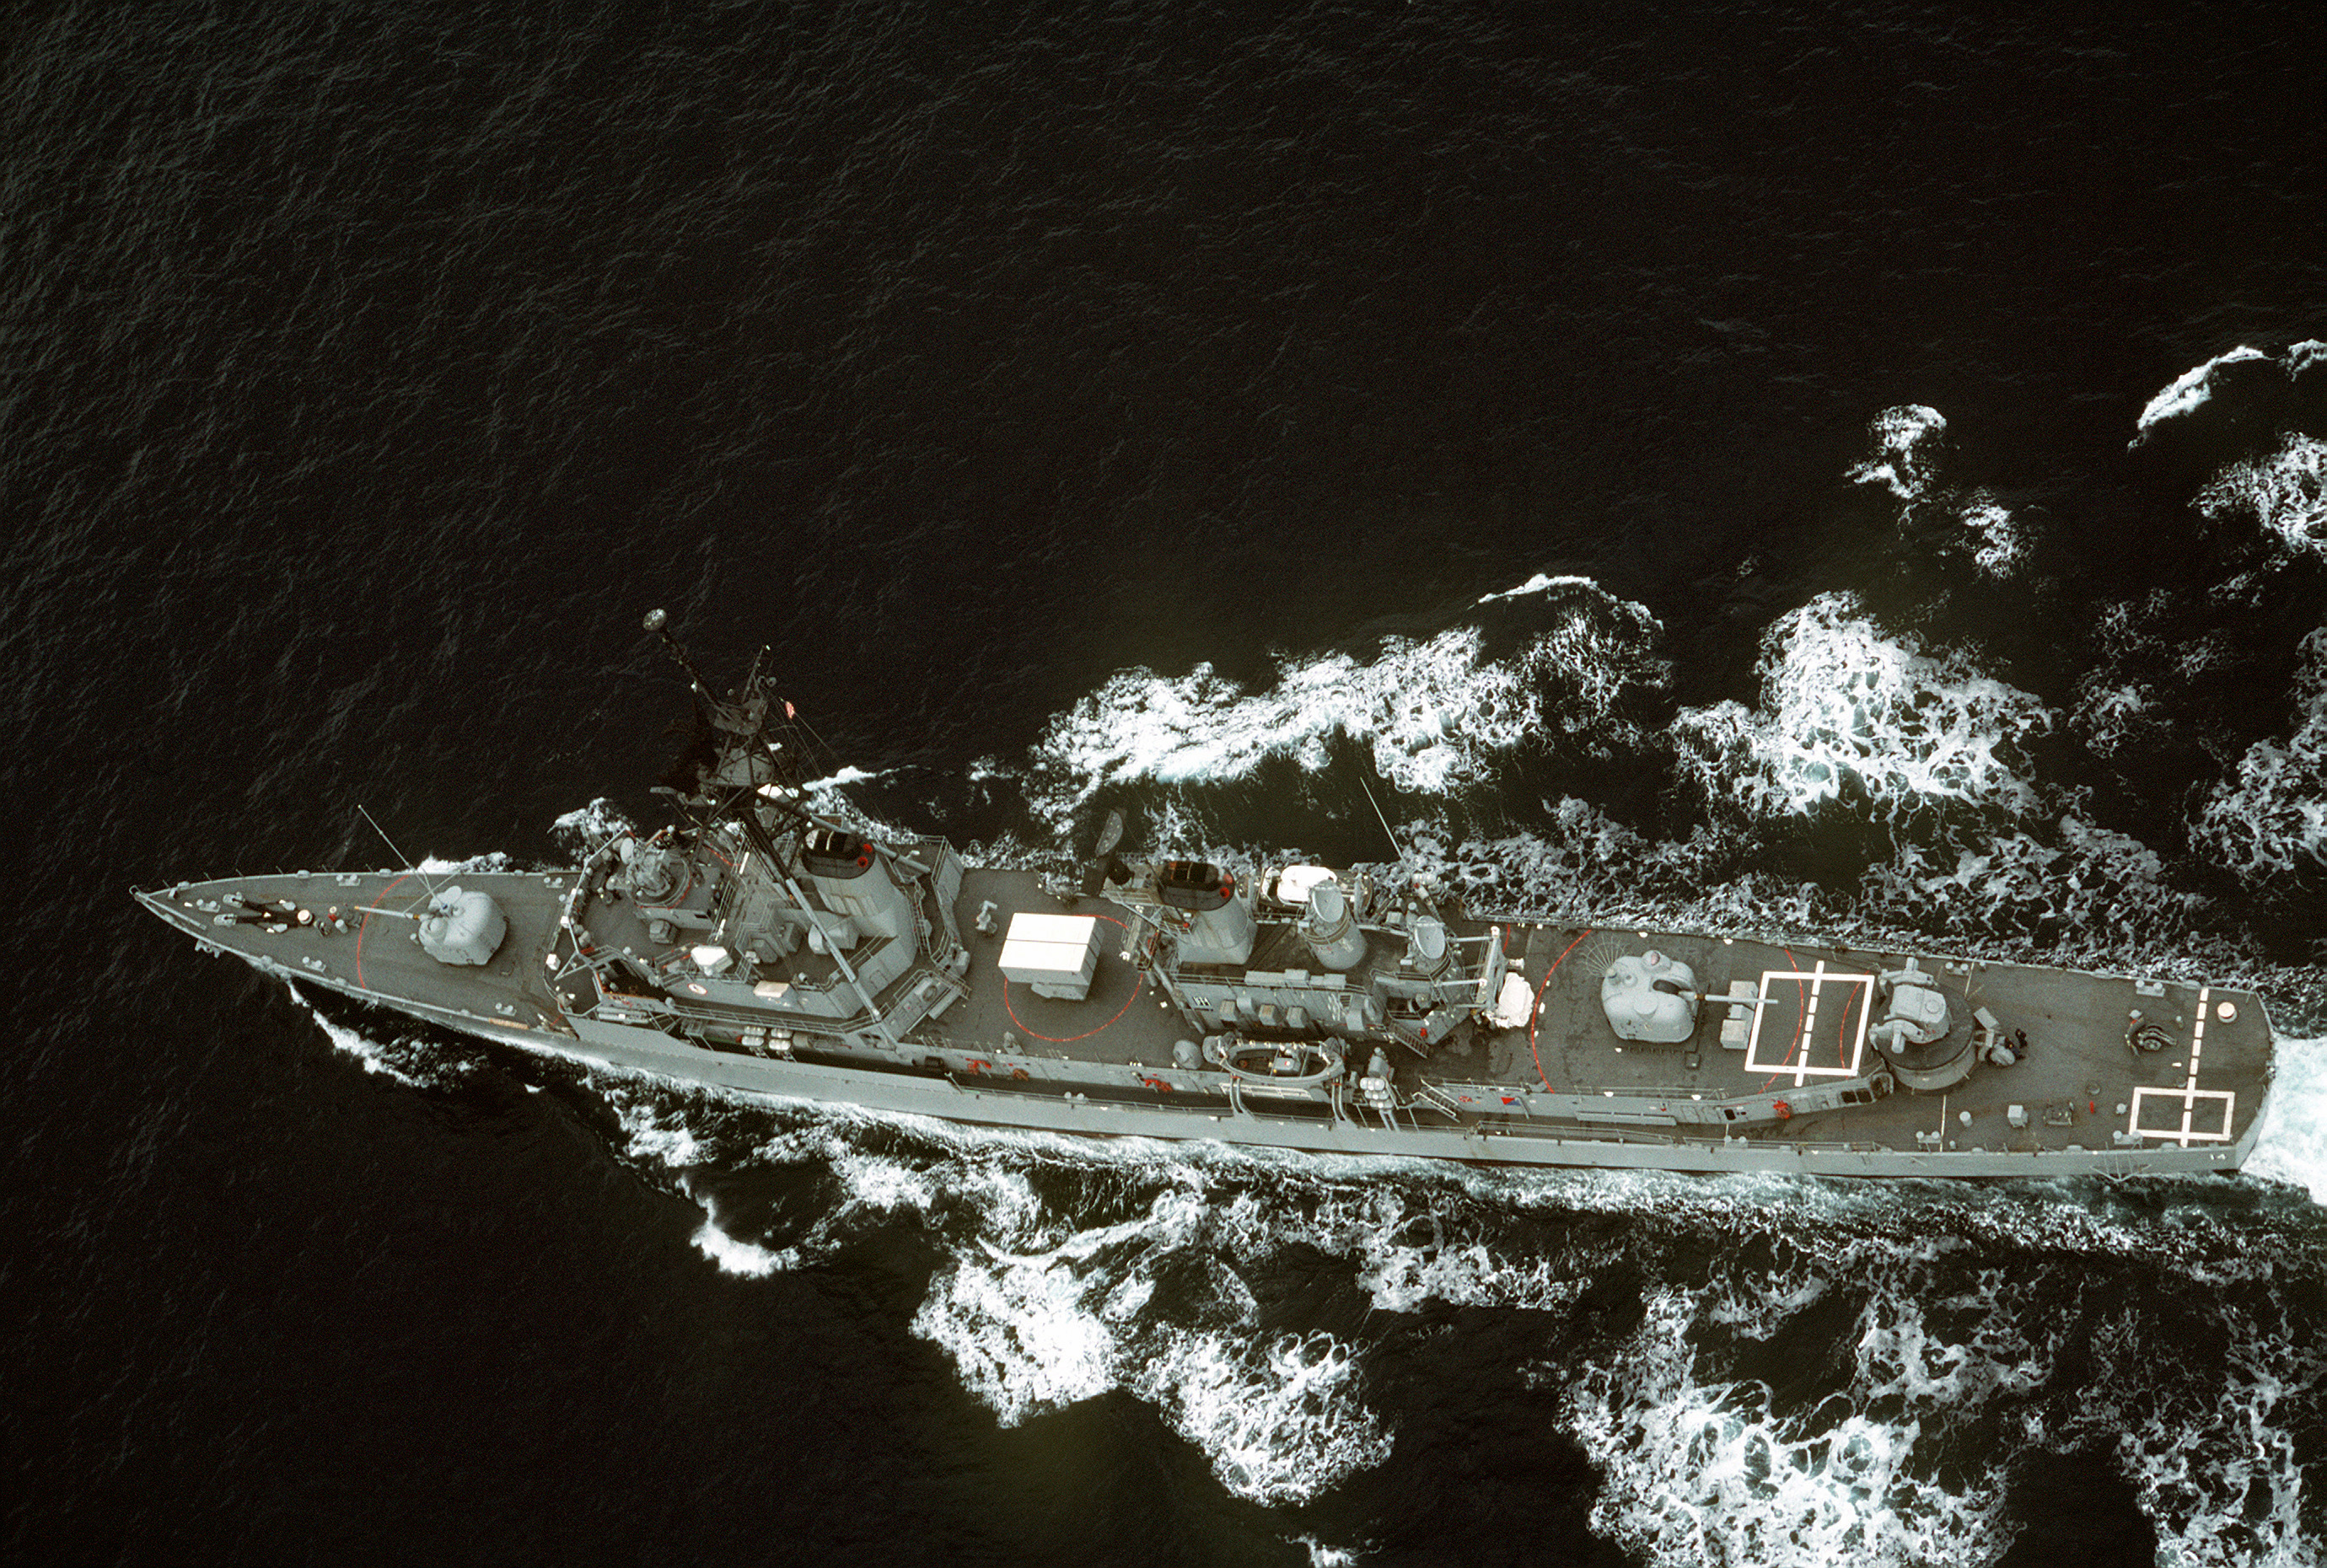 Overhead view of USS Buchanan (DDG-14) underway in the Pacific Ocean, in 1990 (6467508).jpg